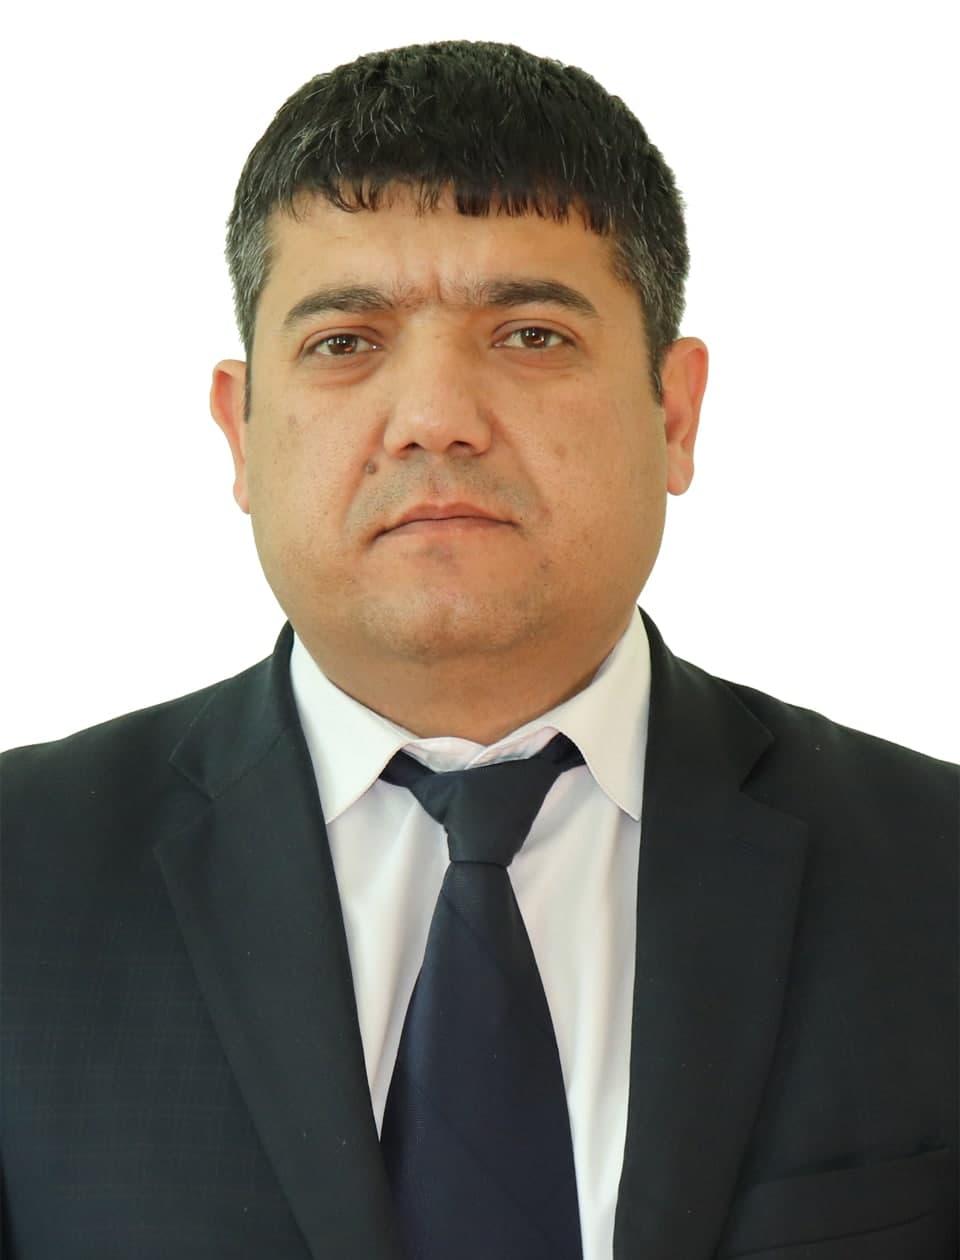 Гадоев Лазиз  Камолович